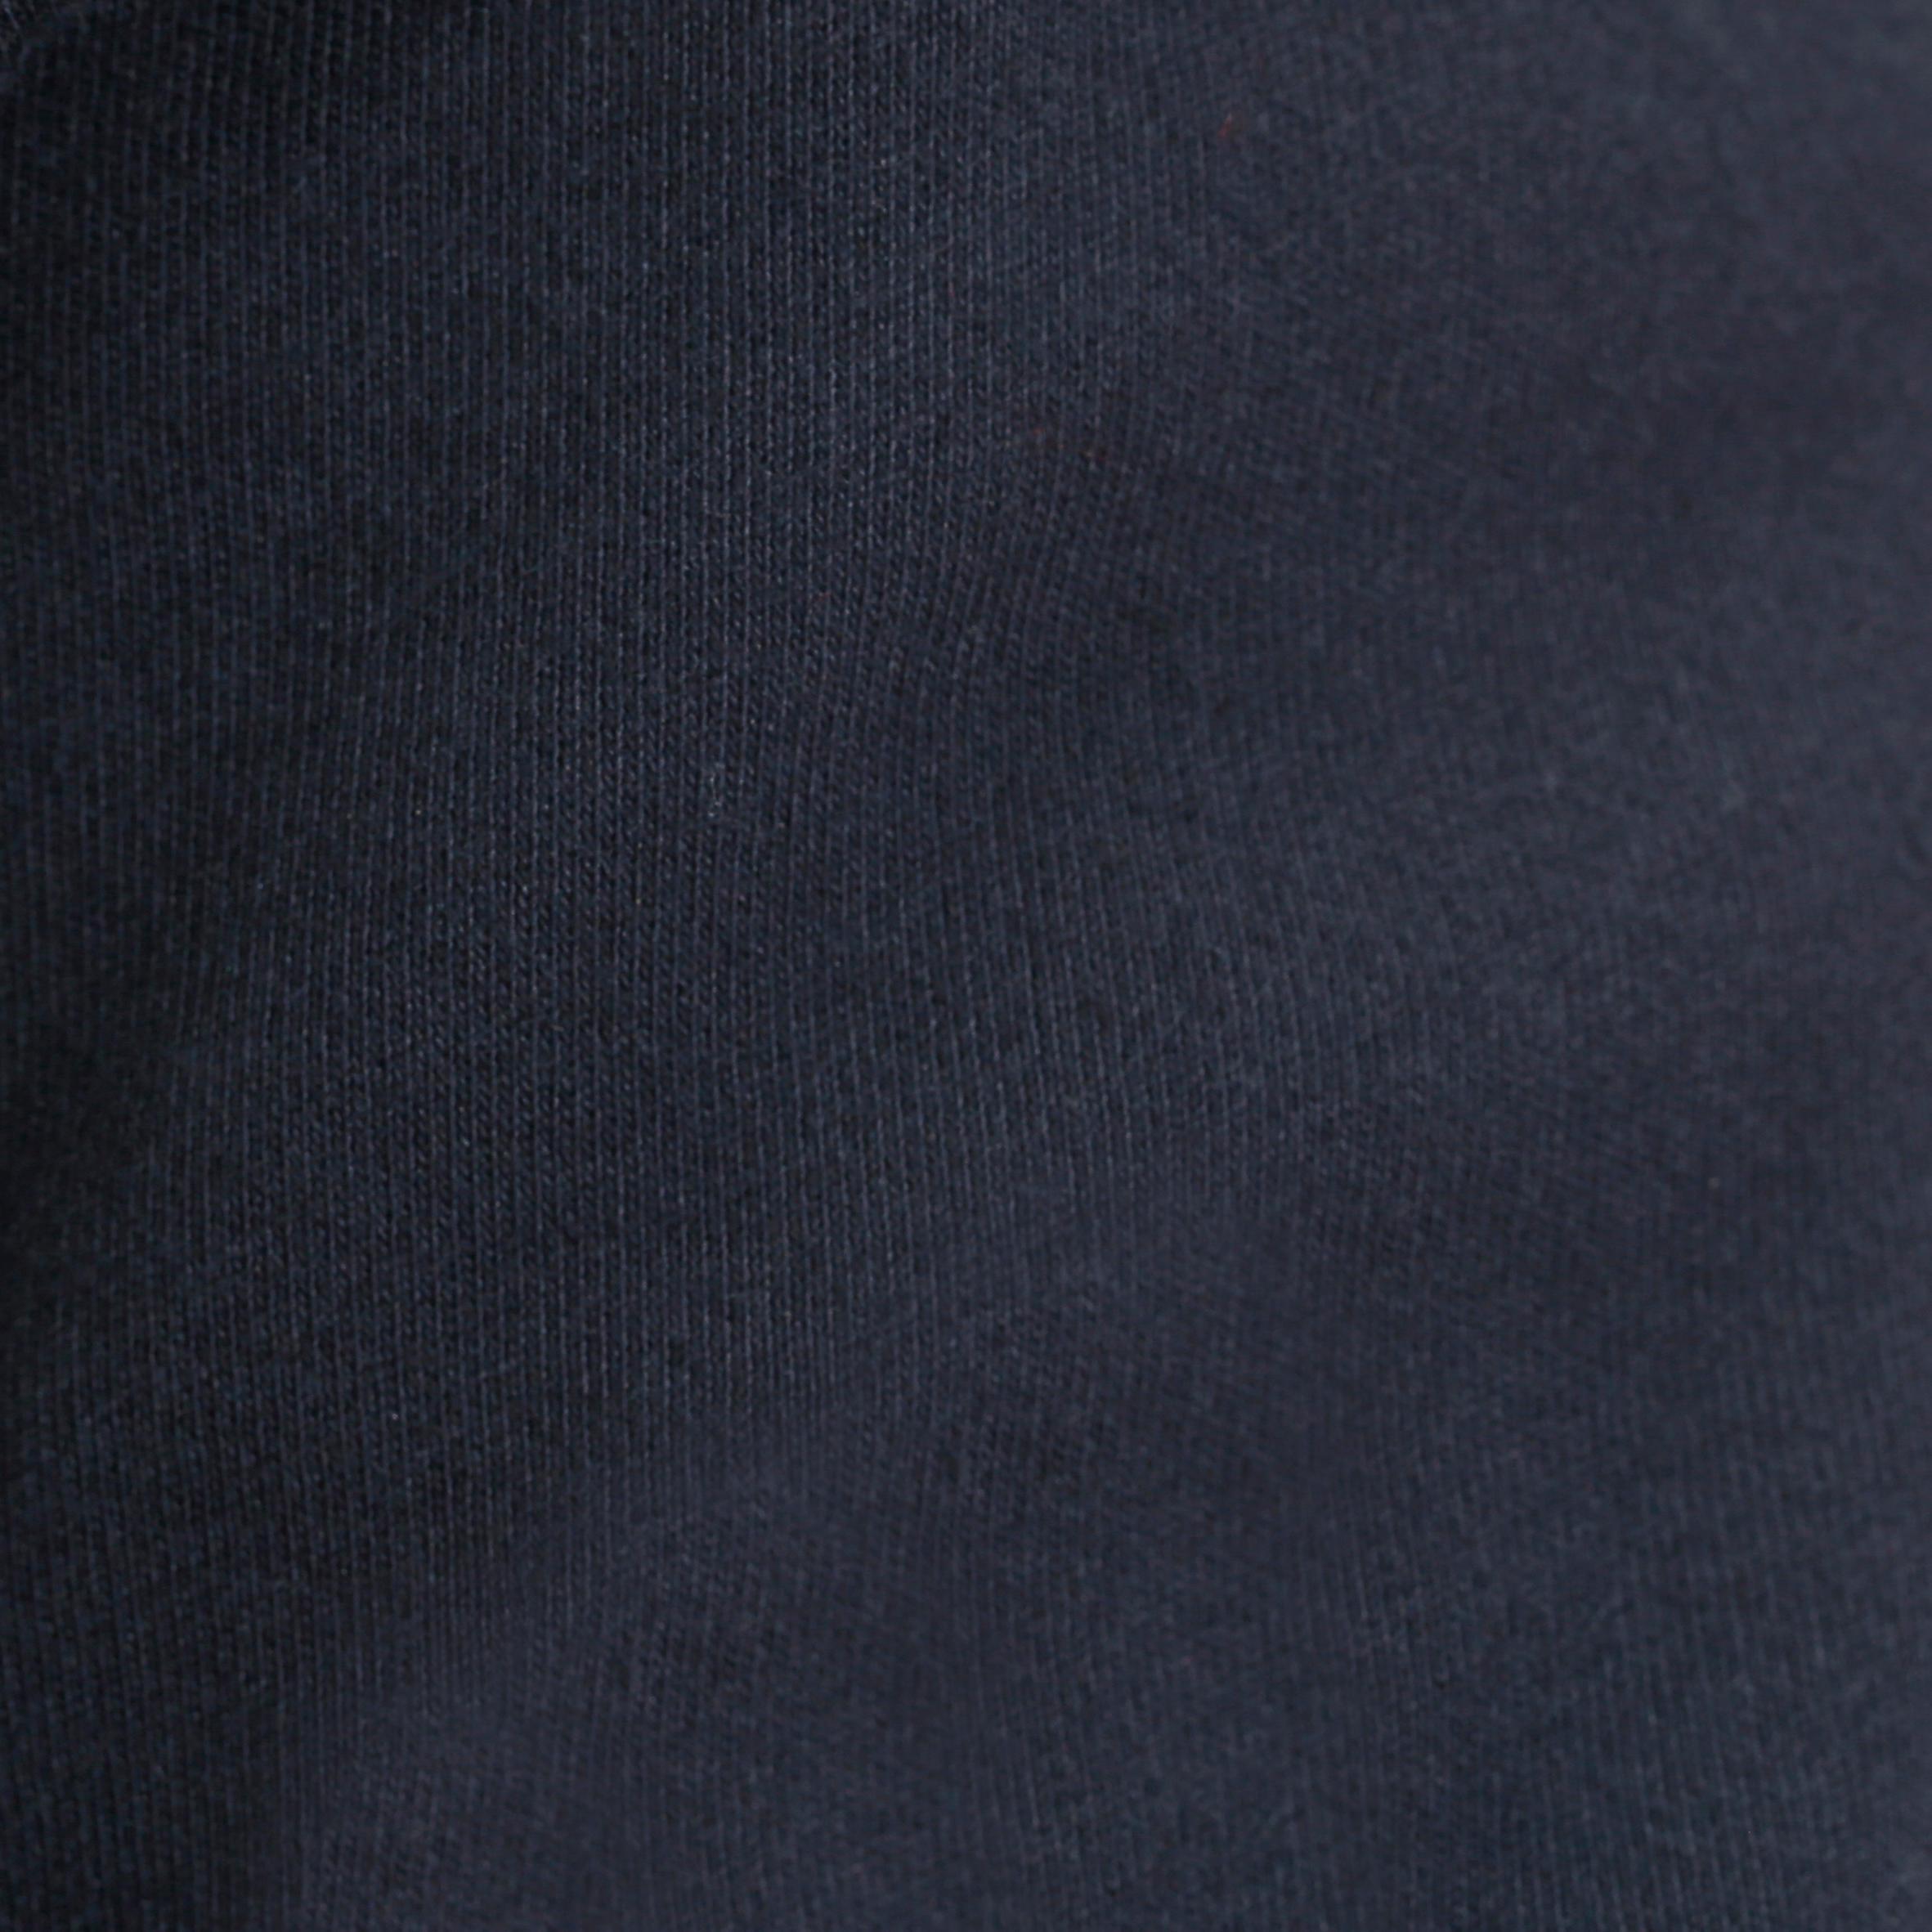 Polo manches longues équitation homme BLASON bleu marine